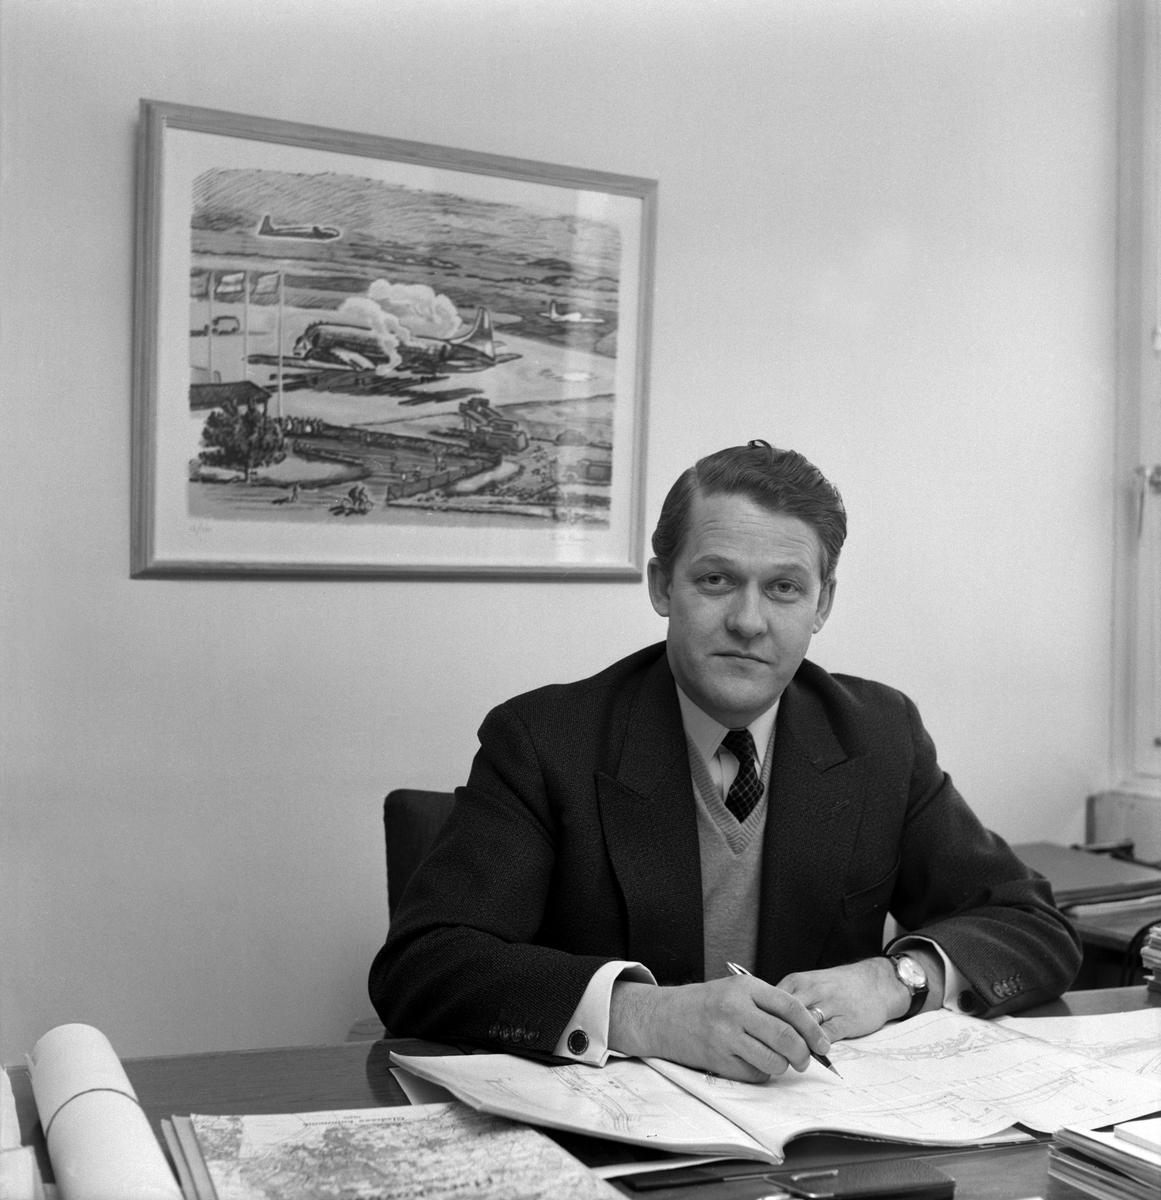 Byråchef S. Samuelsson